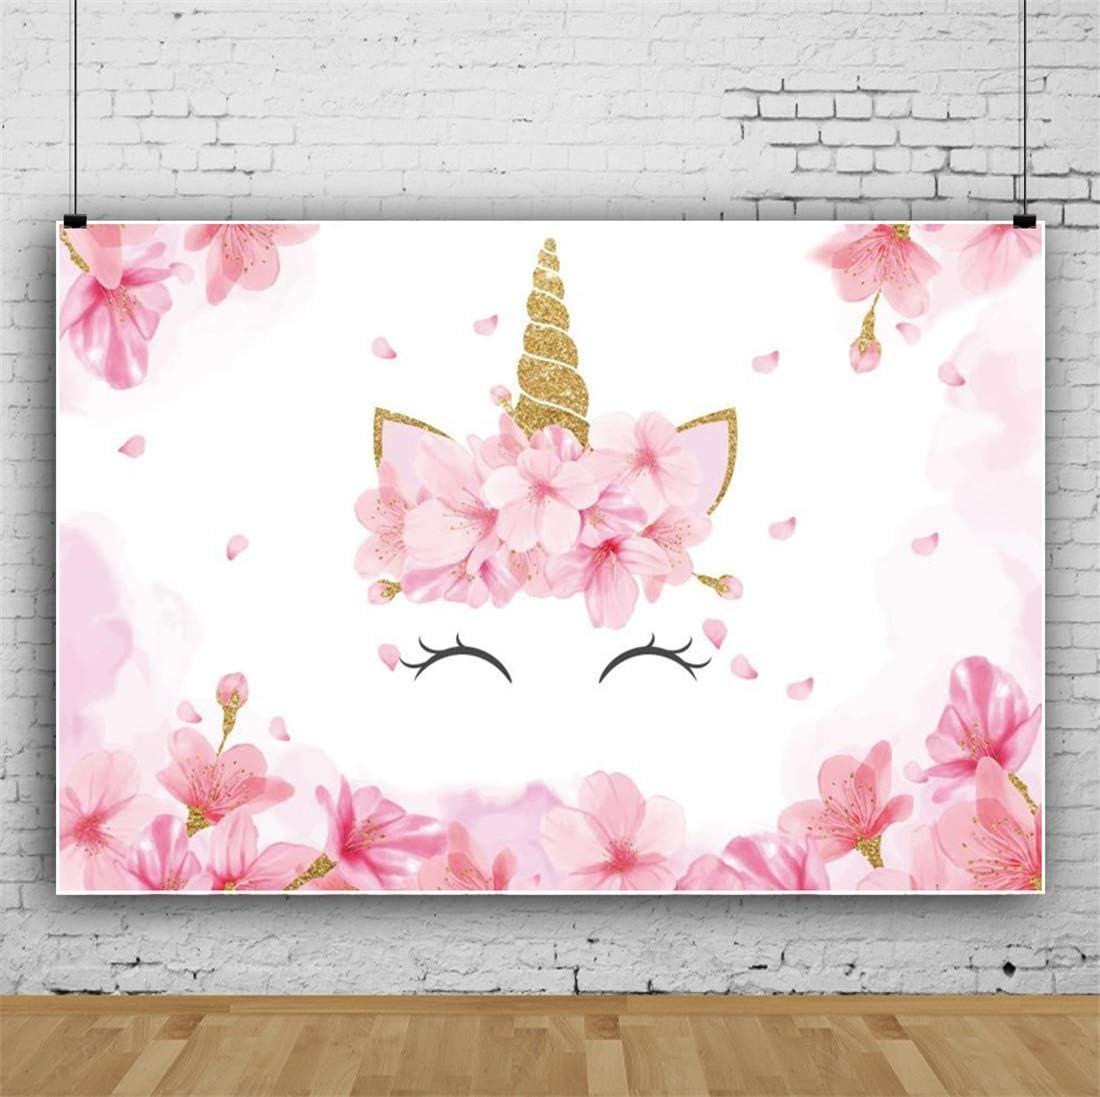 Yeele 10x8ft Unicorn Birthday Background for Photography Happy Birthday Party Decoration Pink Flowers Bud Rose Boy Girl Child Photo Backdrop Portrait Studio Props Wallpaper